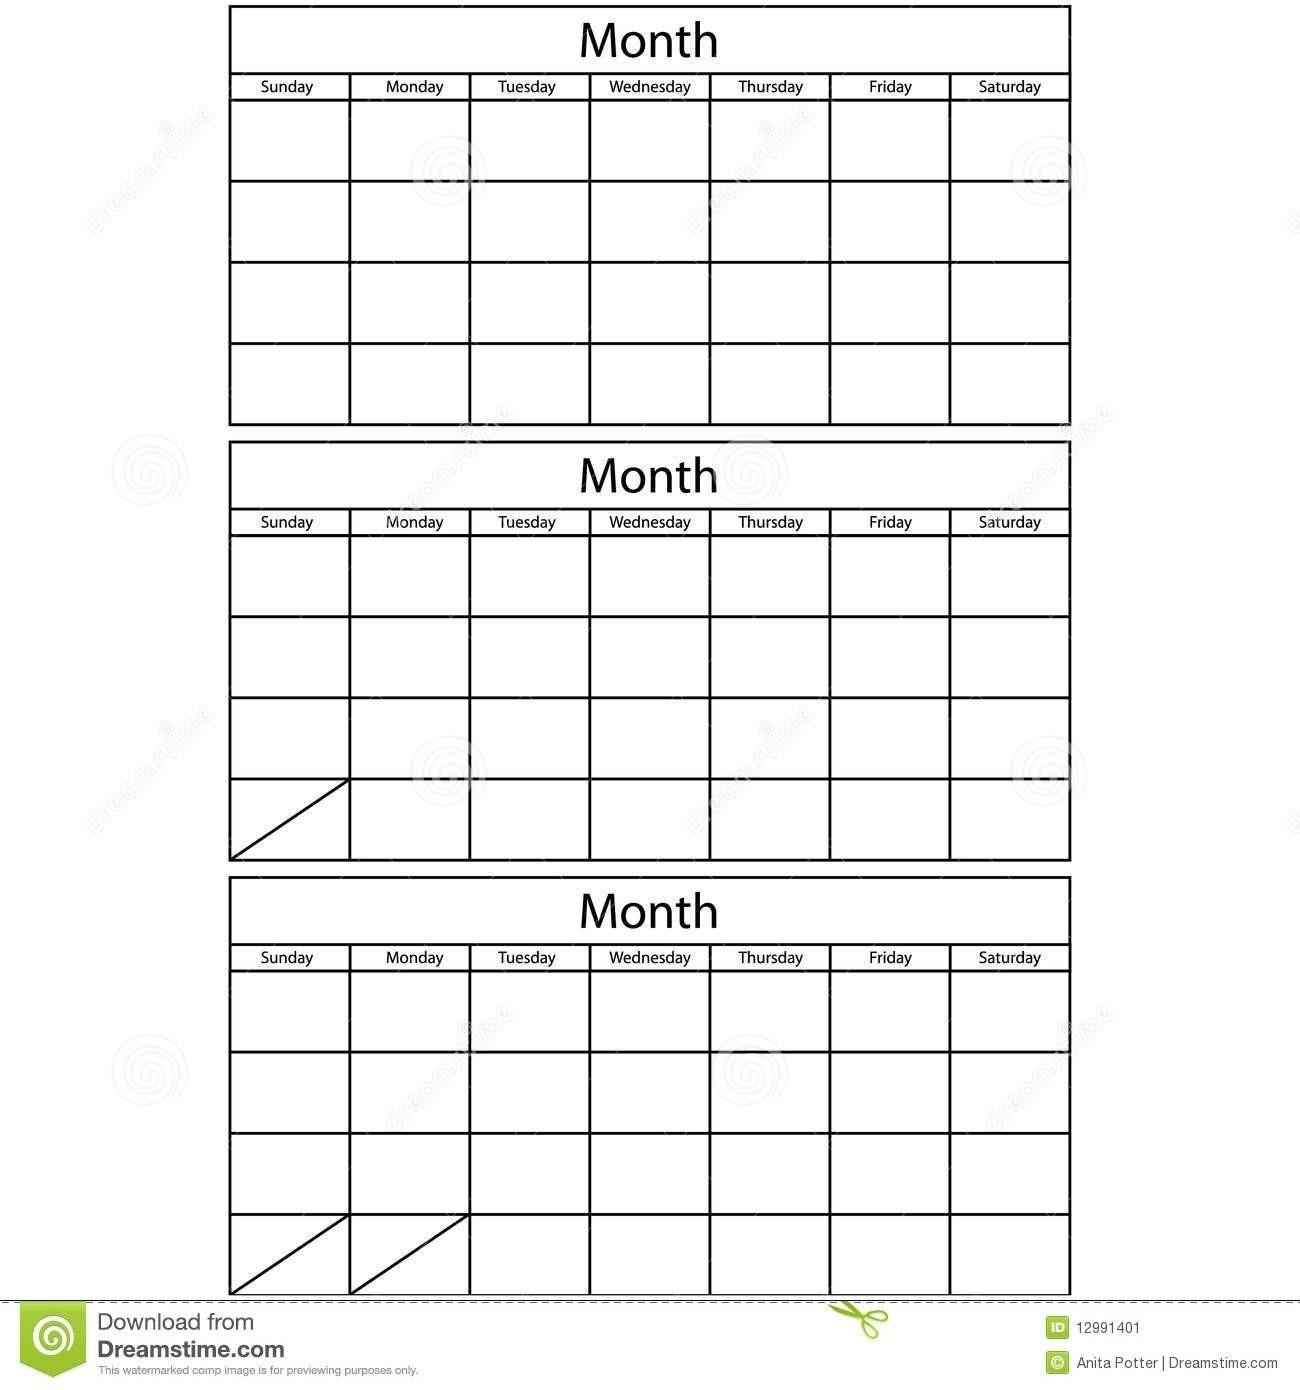 Free Printable Calendars 3 Month Calendar Printable Markazeslami  Xjb